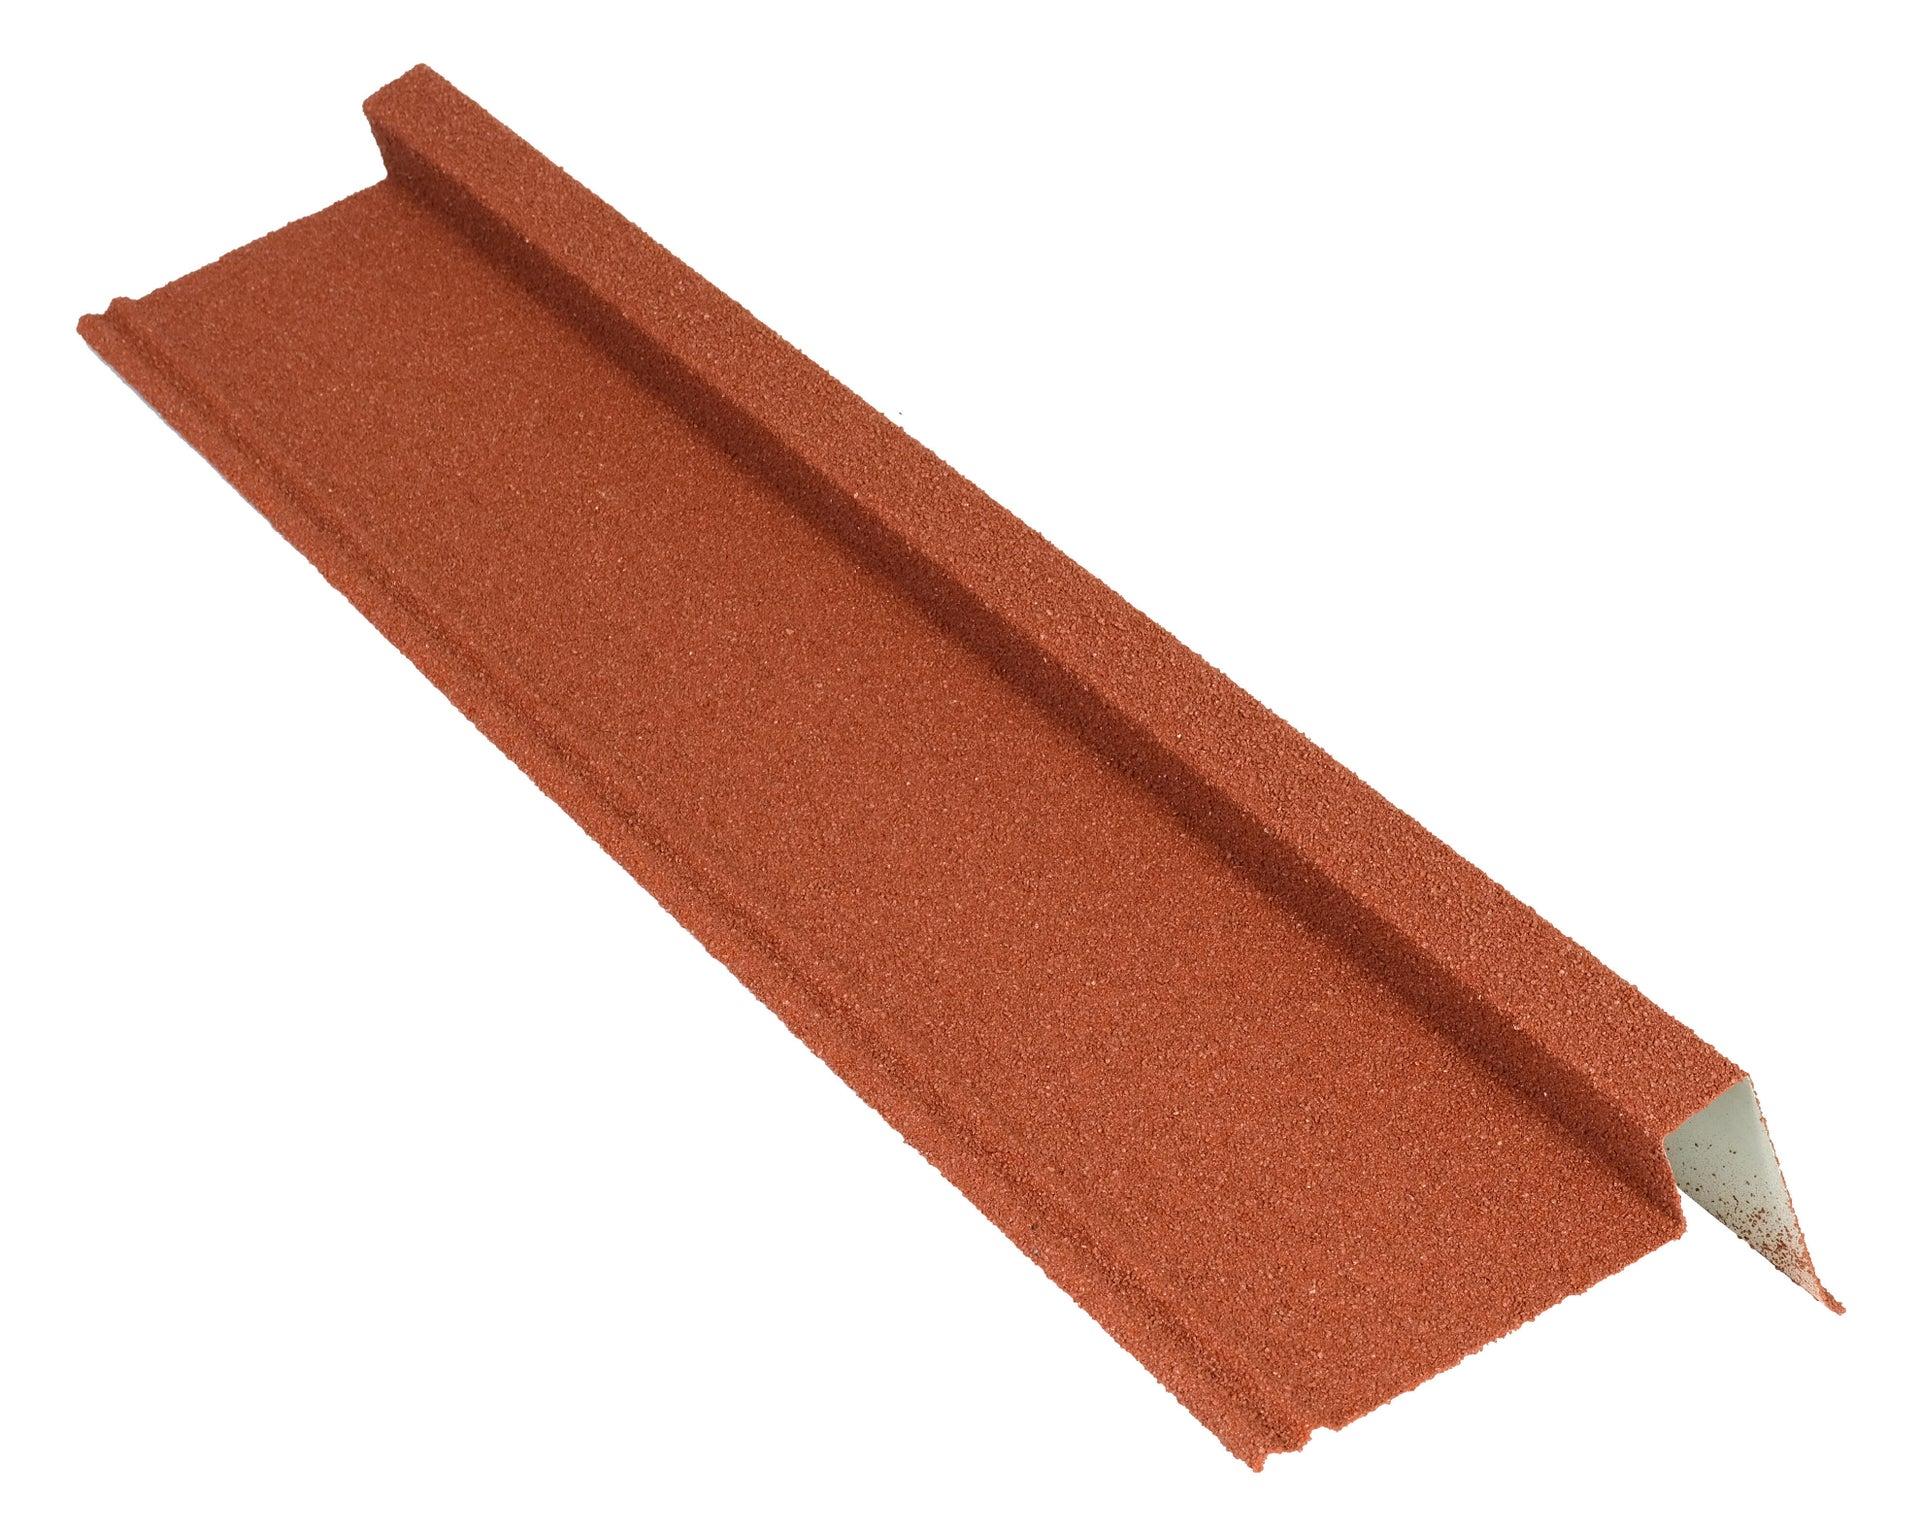 Fascia IKO in acciaio 0.91 x 91 cm - 2